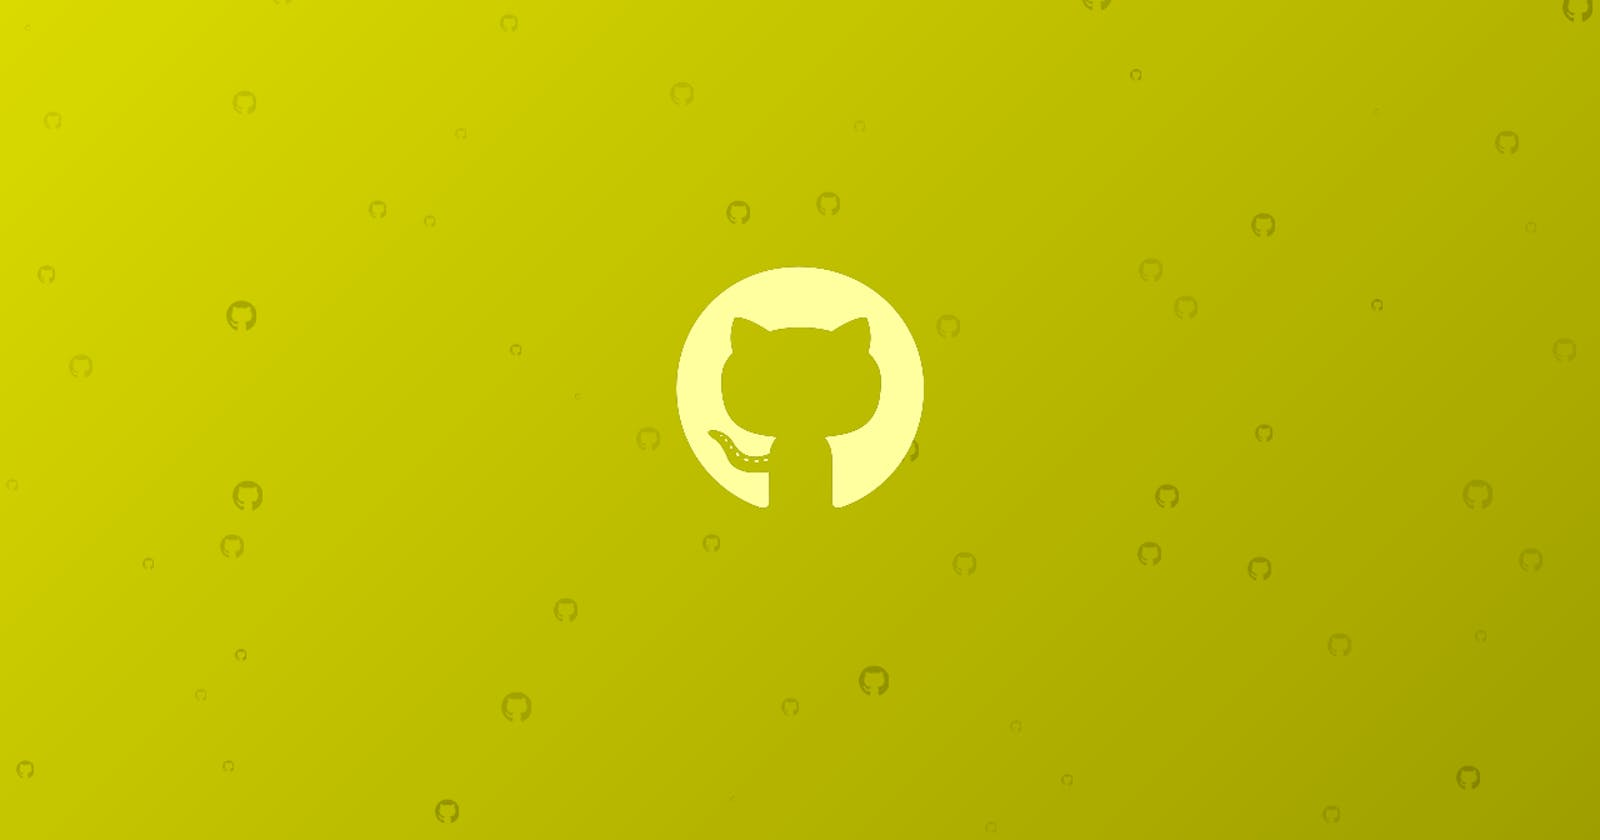 Automating Project Maintenance on Github